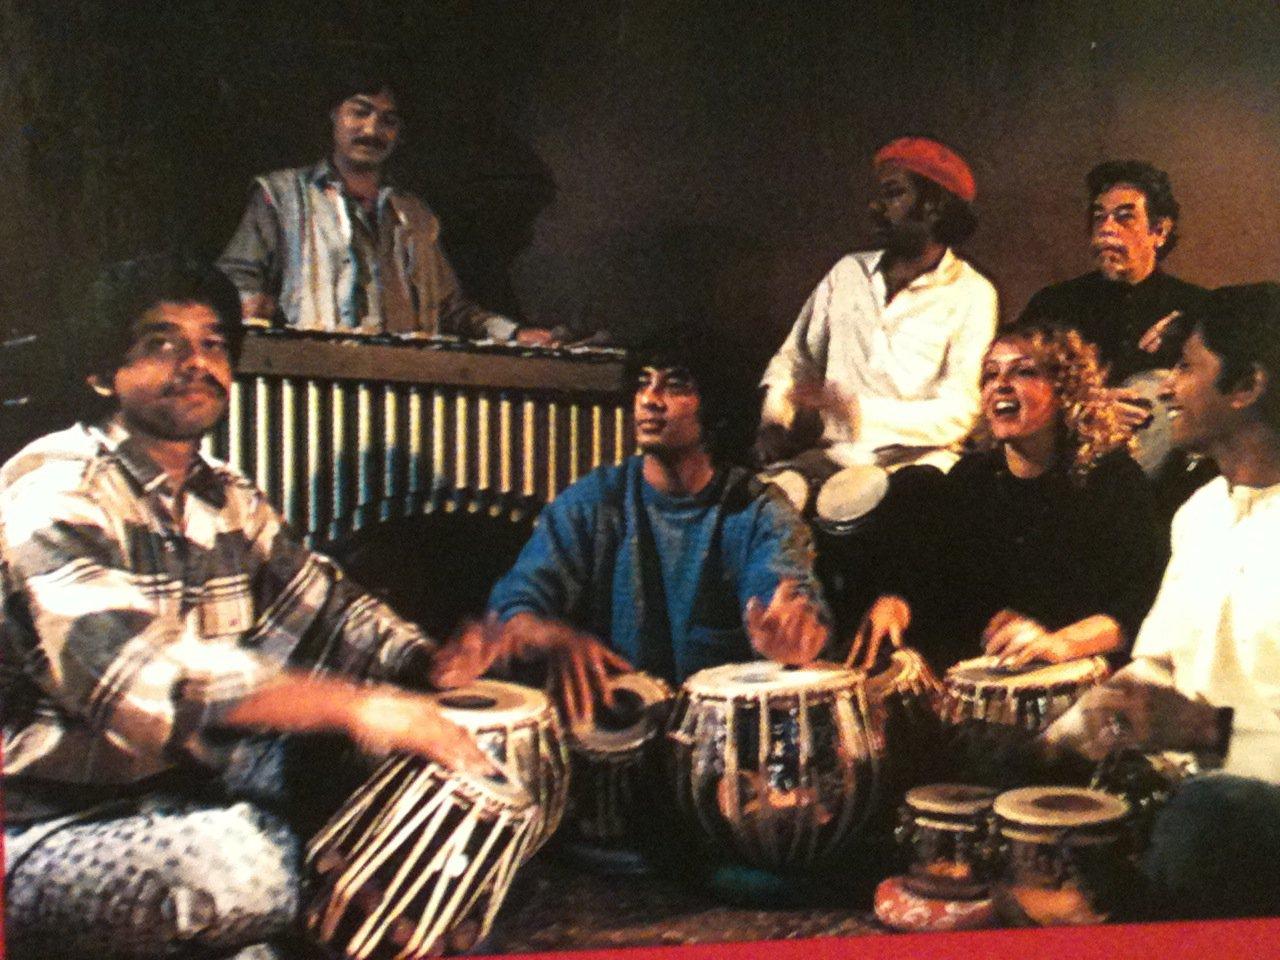 Zakir Hussain and the Rhythm Experience, Marin County